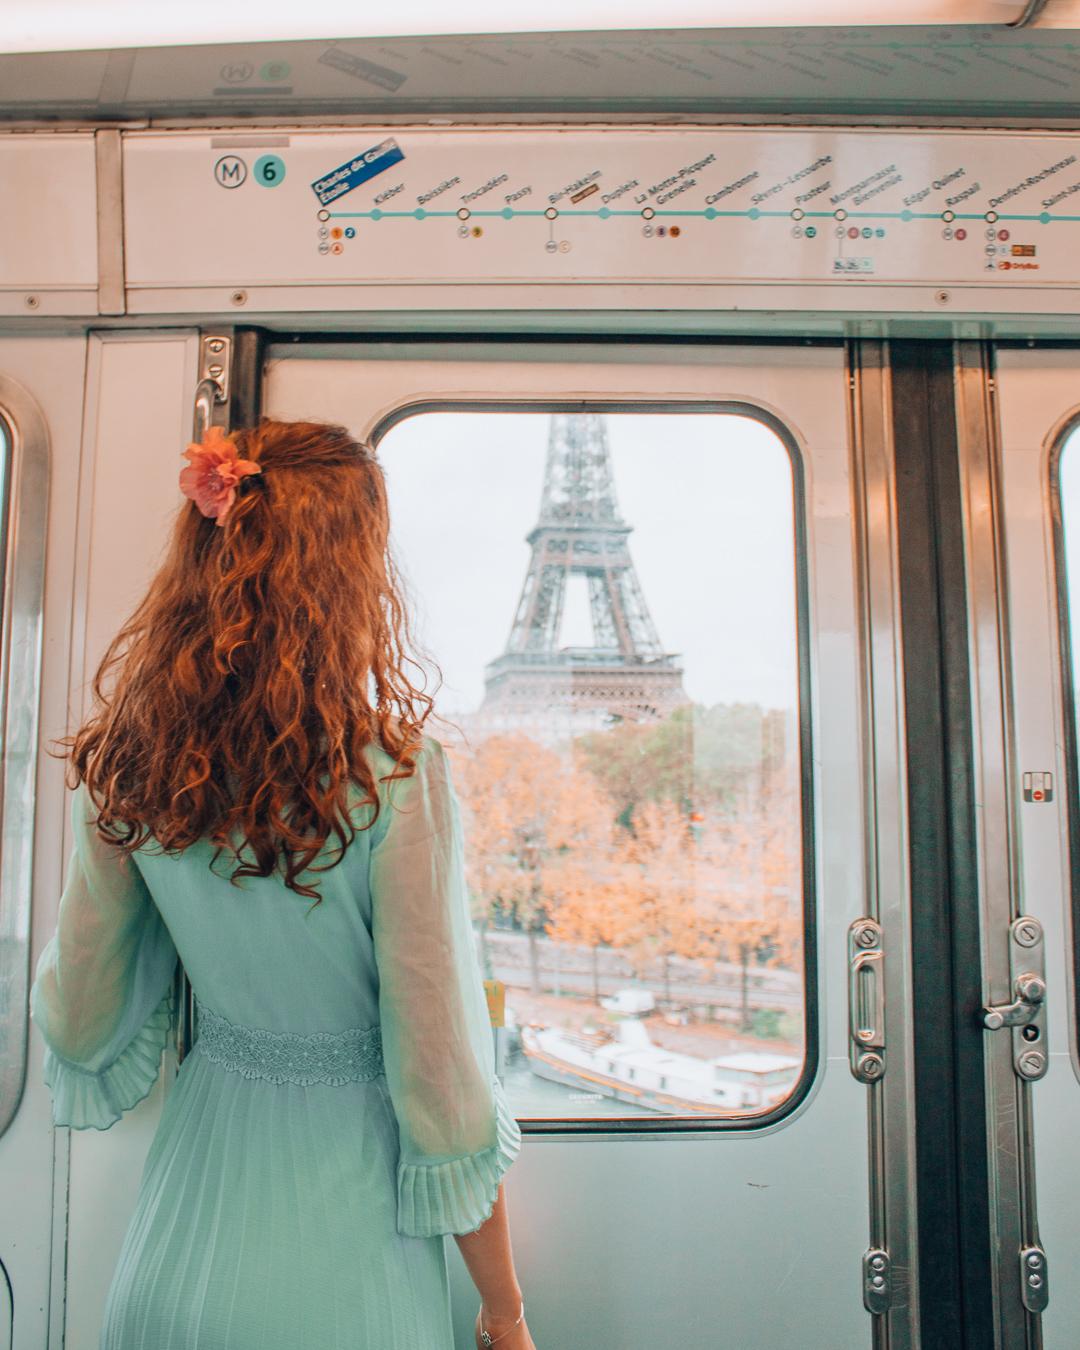 Girl in metro in Paris looking at the Eiffel Tower